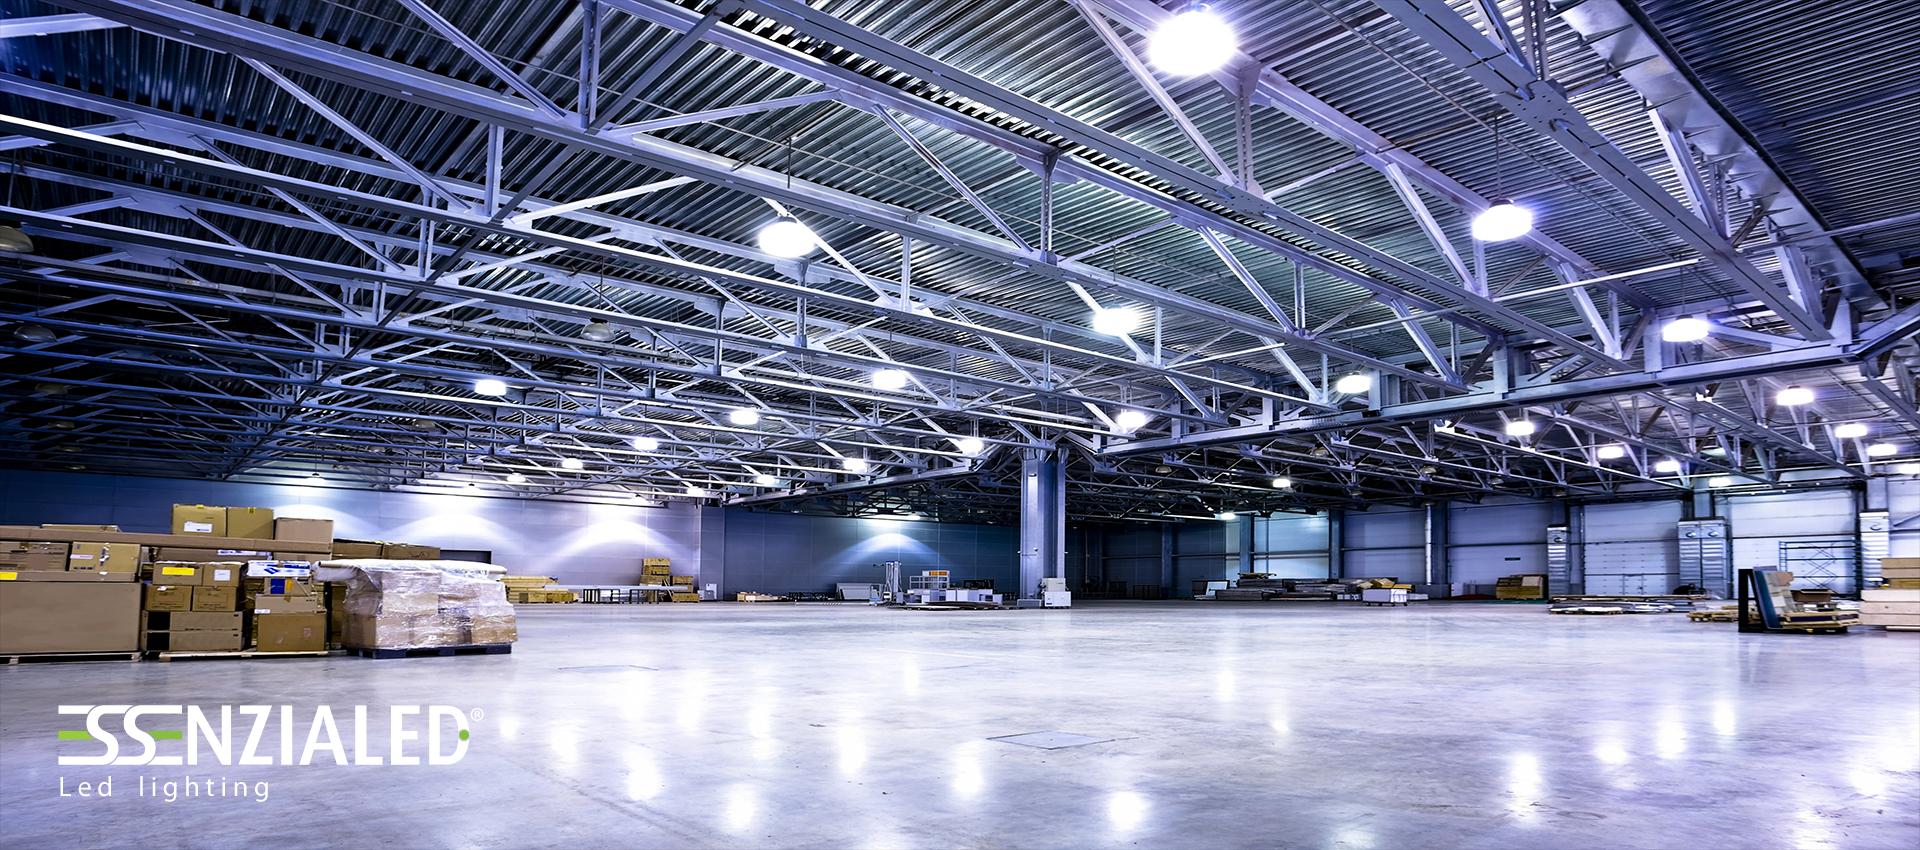 Illuminazione Industriale Led: Illuminazione industriale led round per.